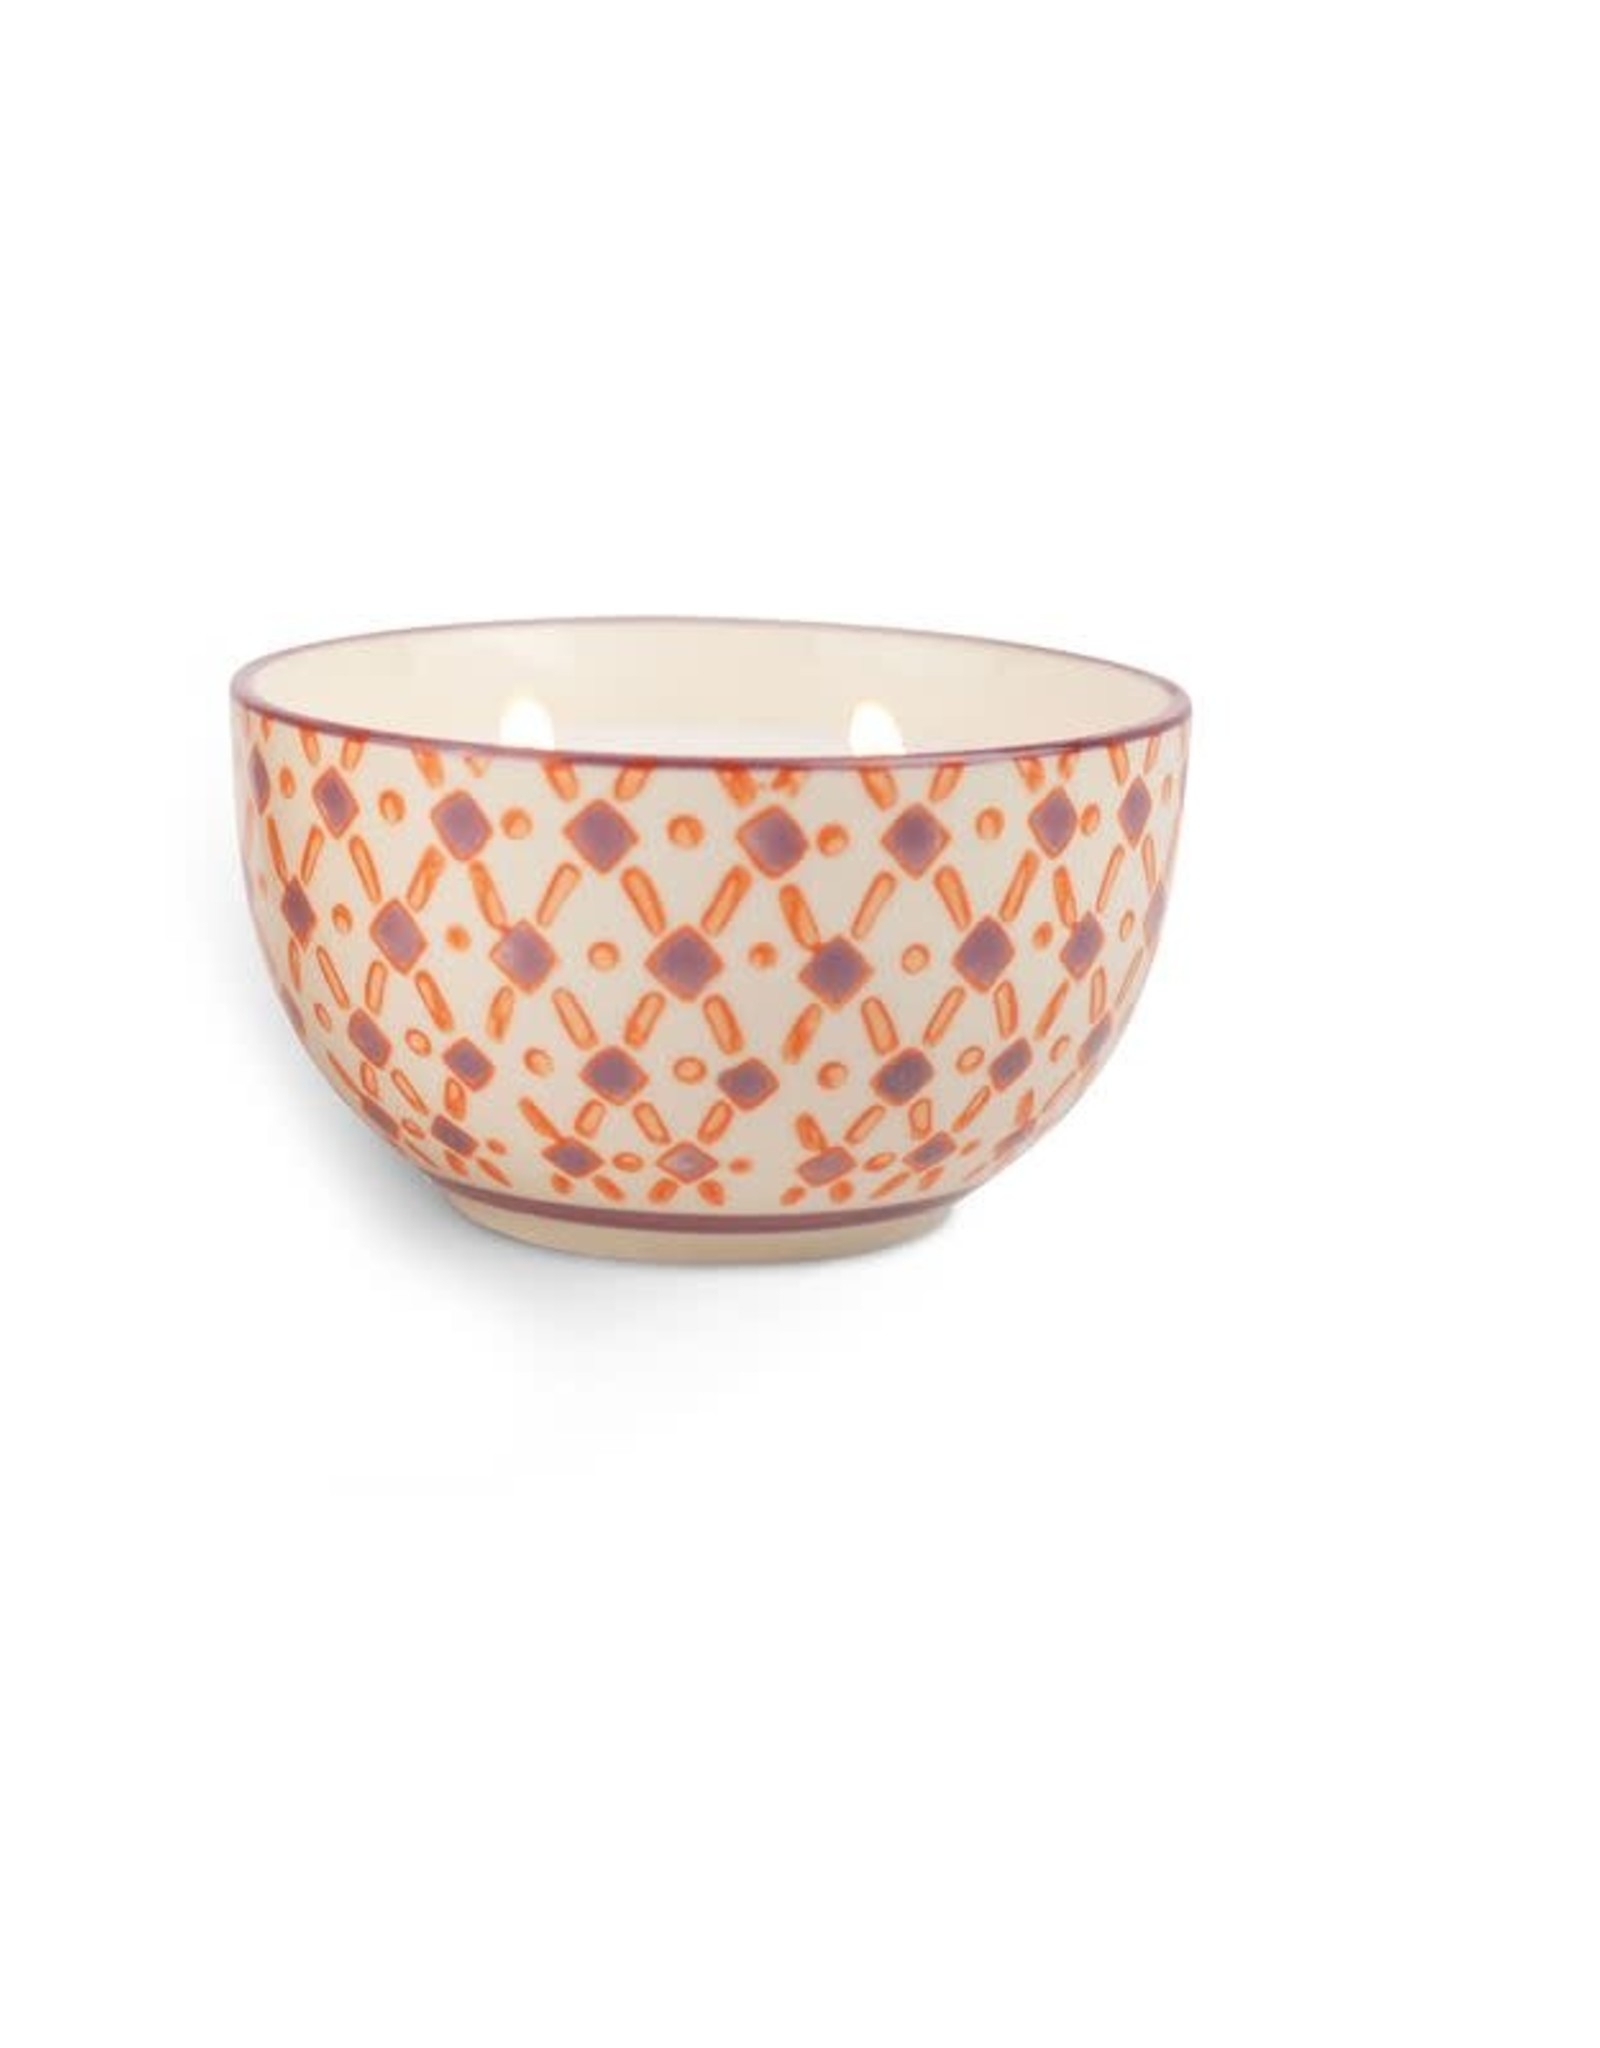 Boheme 7oz Hand Painted Bowl - Pink Pepper & Pomelo